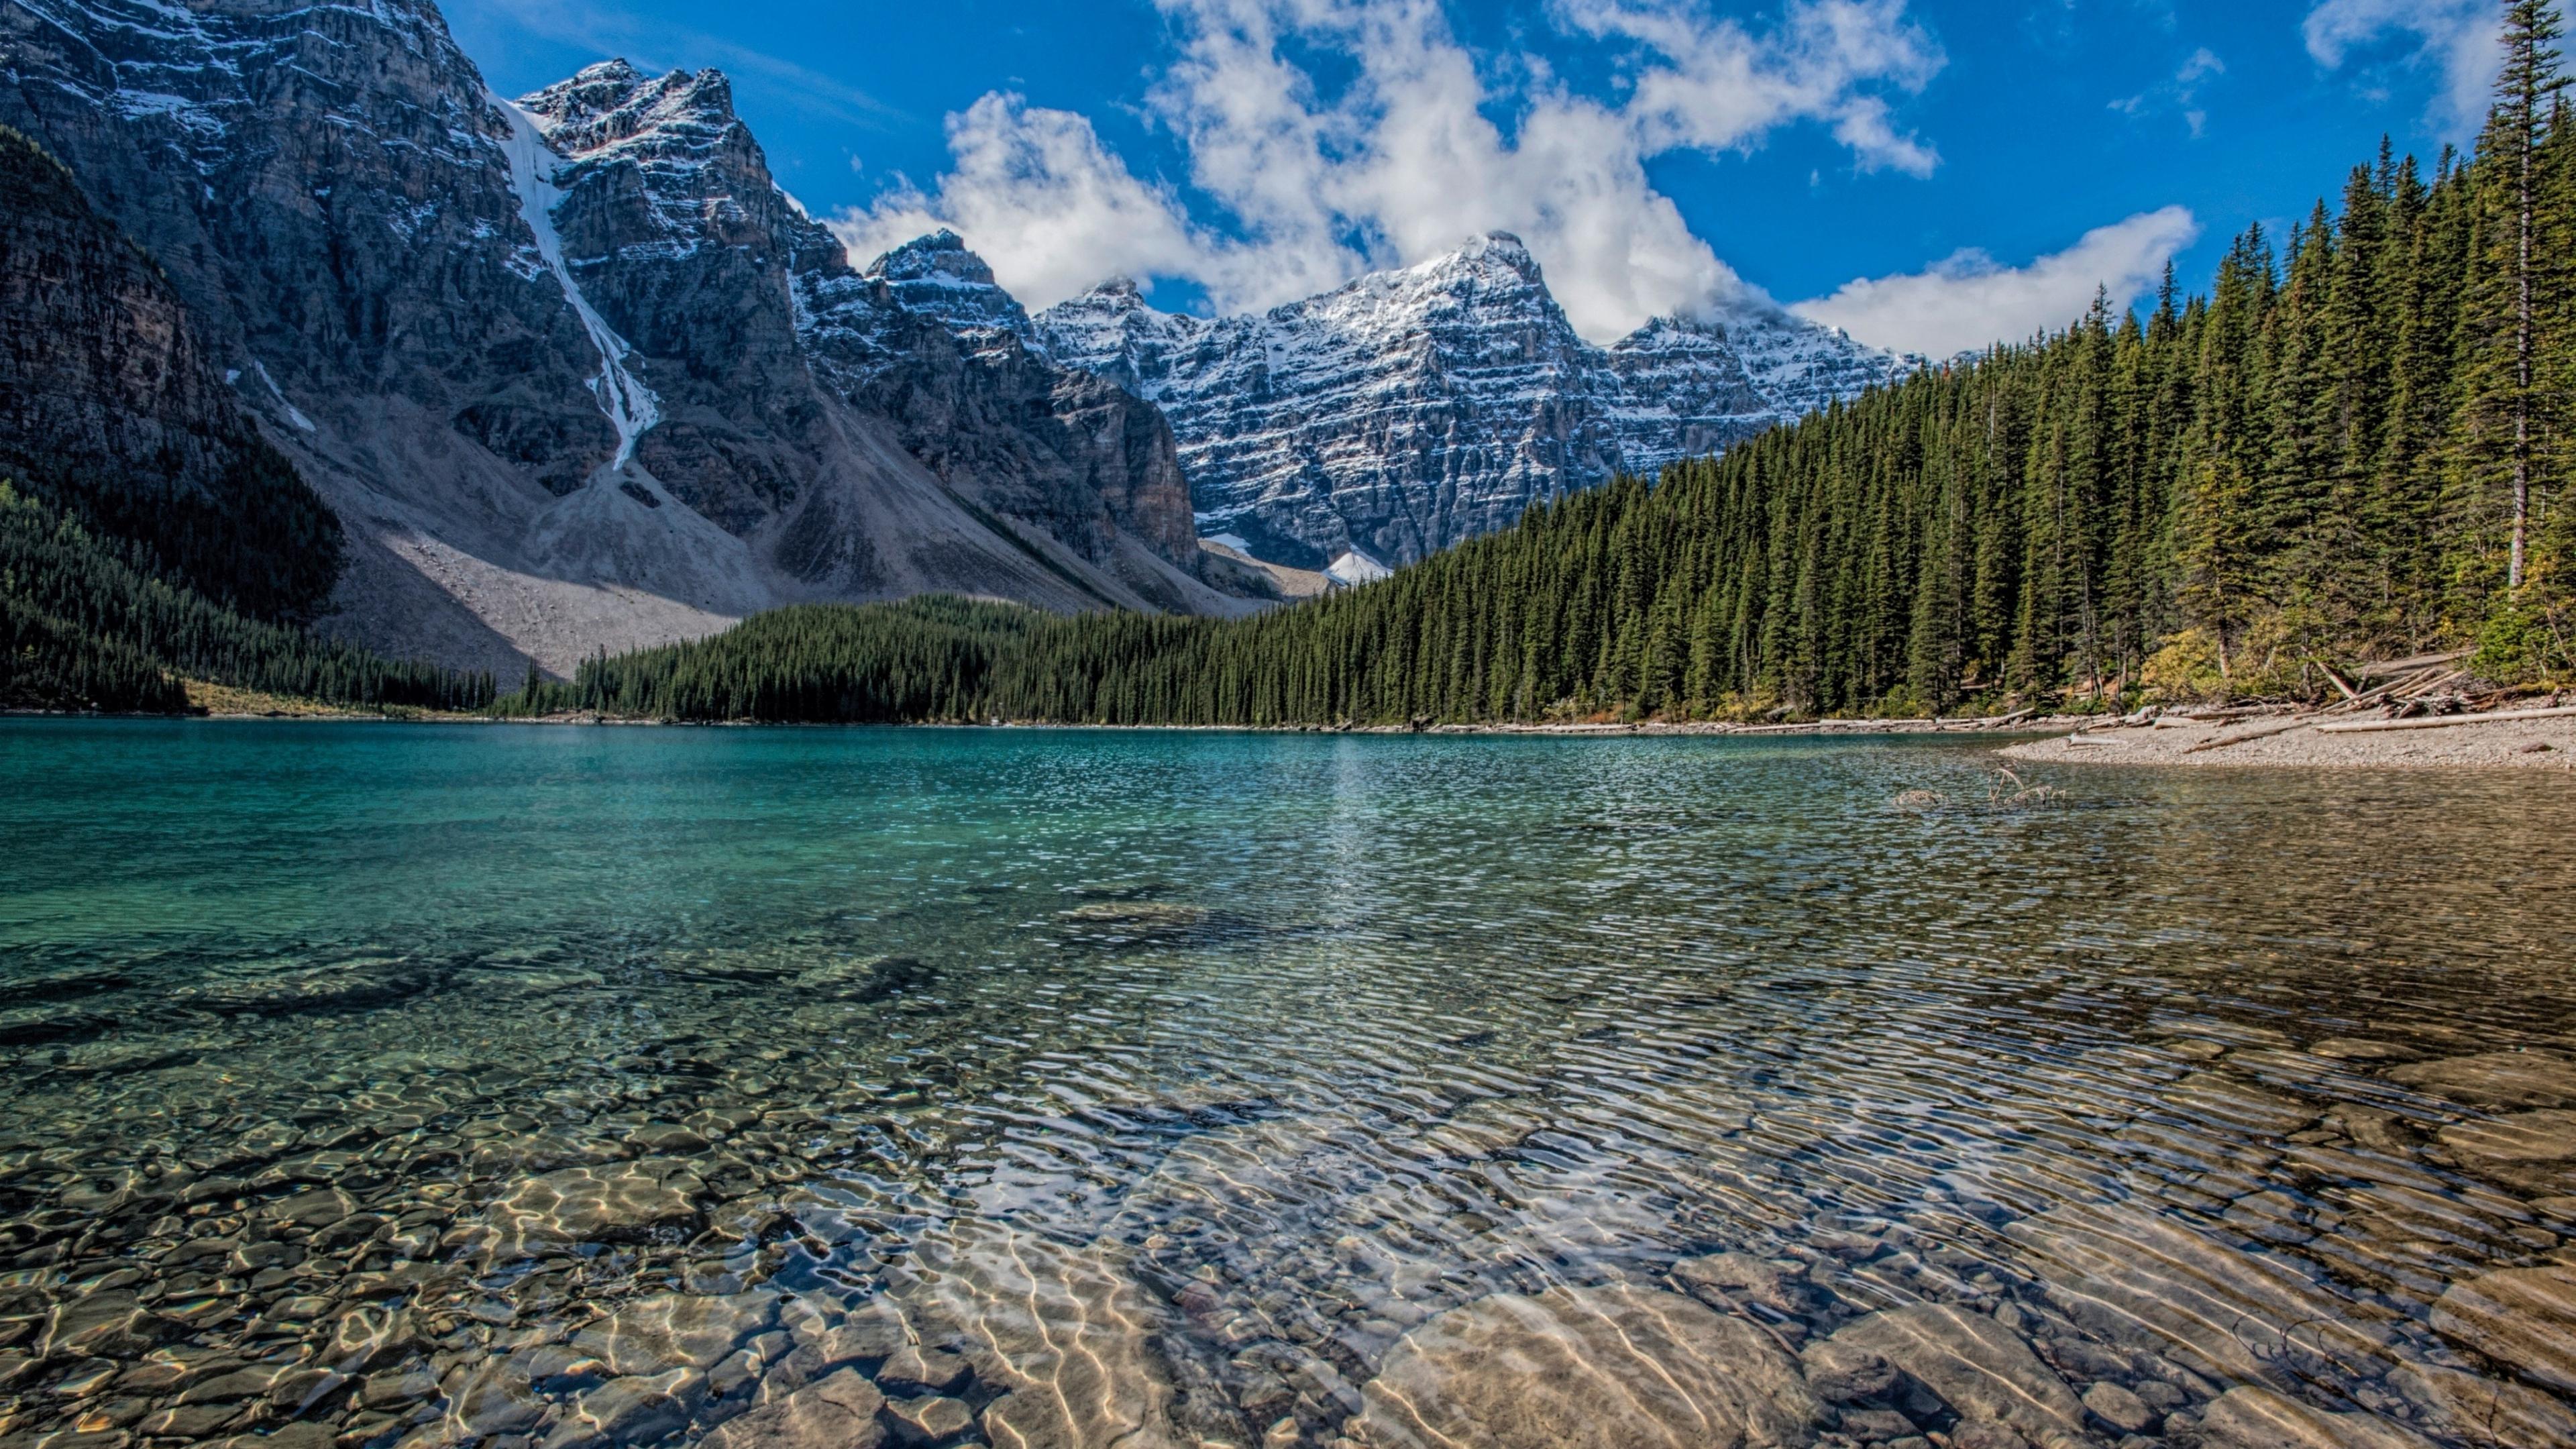 Download 3840x2160 wallpaper clean lake mountains range - Nature wallpaper hd 16 9 ...